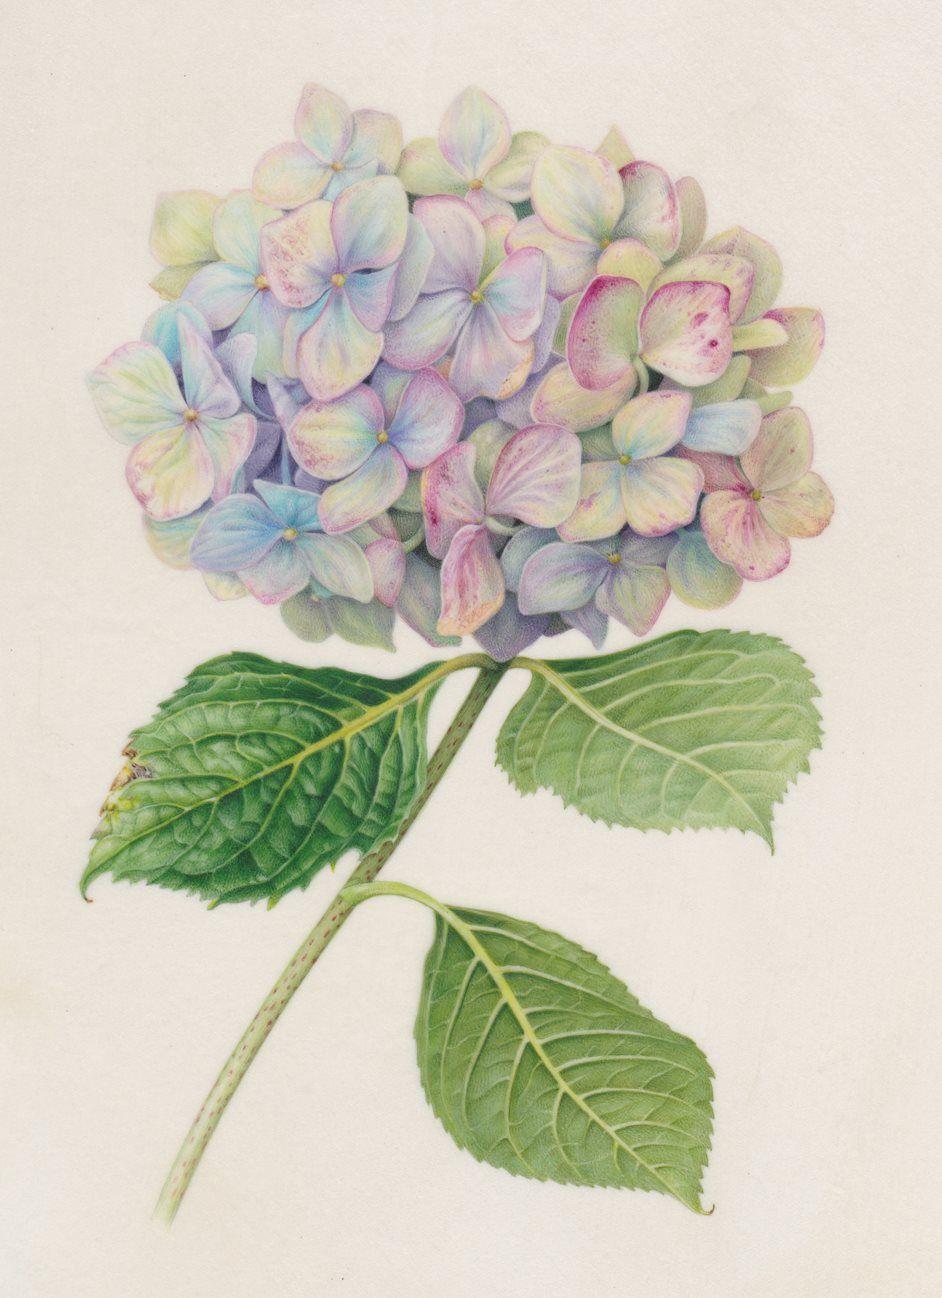 Hydrangea Wall Art antique hydrangea botanical prints vintage prints garden wall art